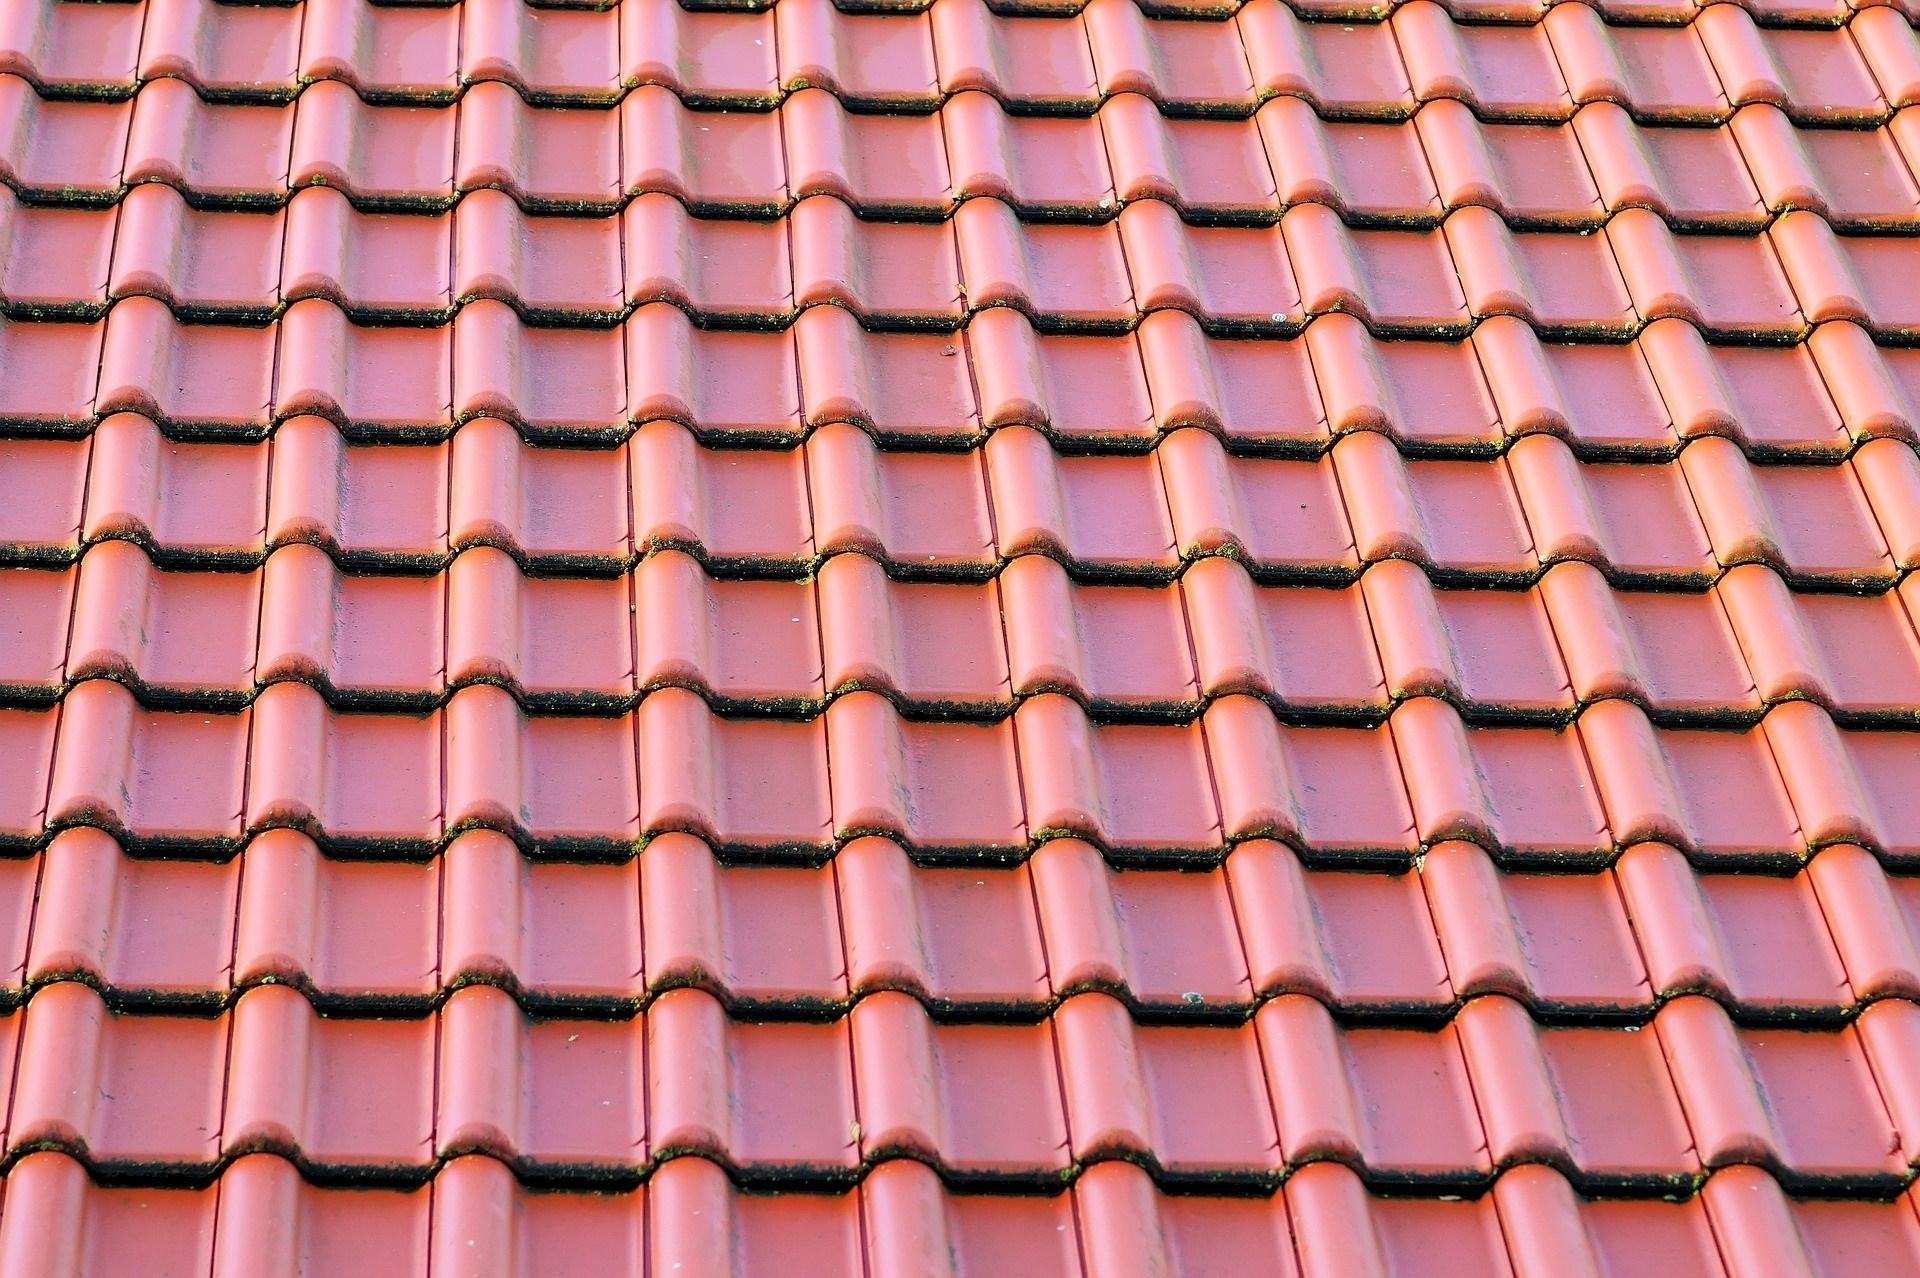 Roof Pressure Washing.jpg